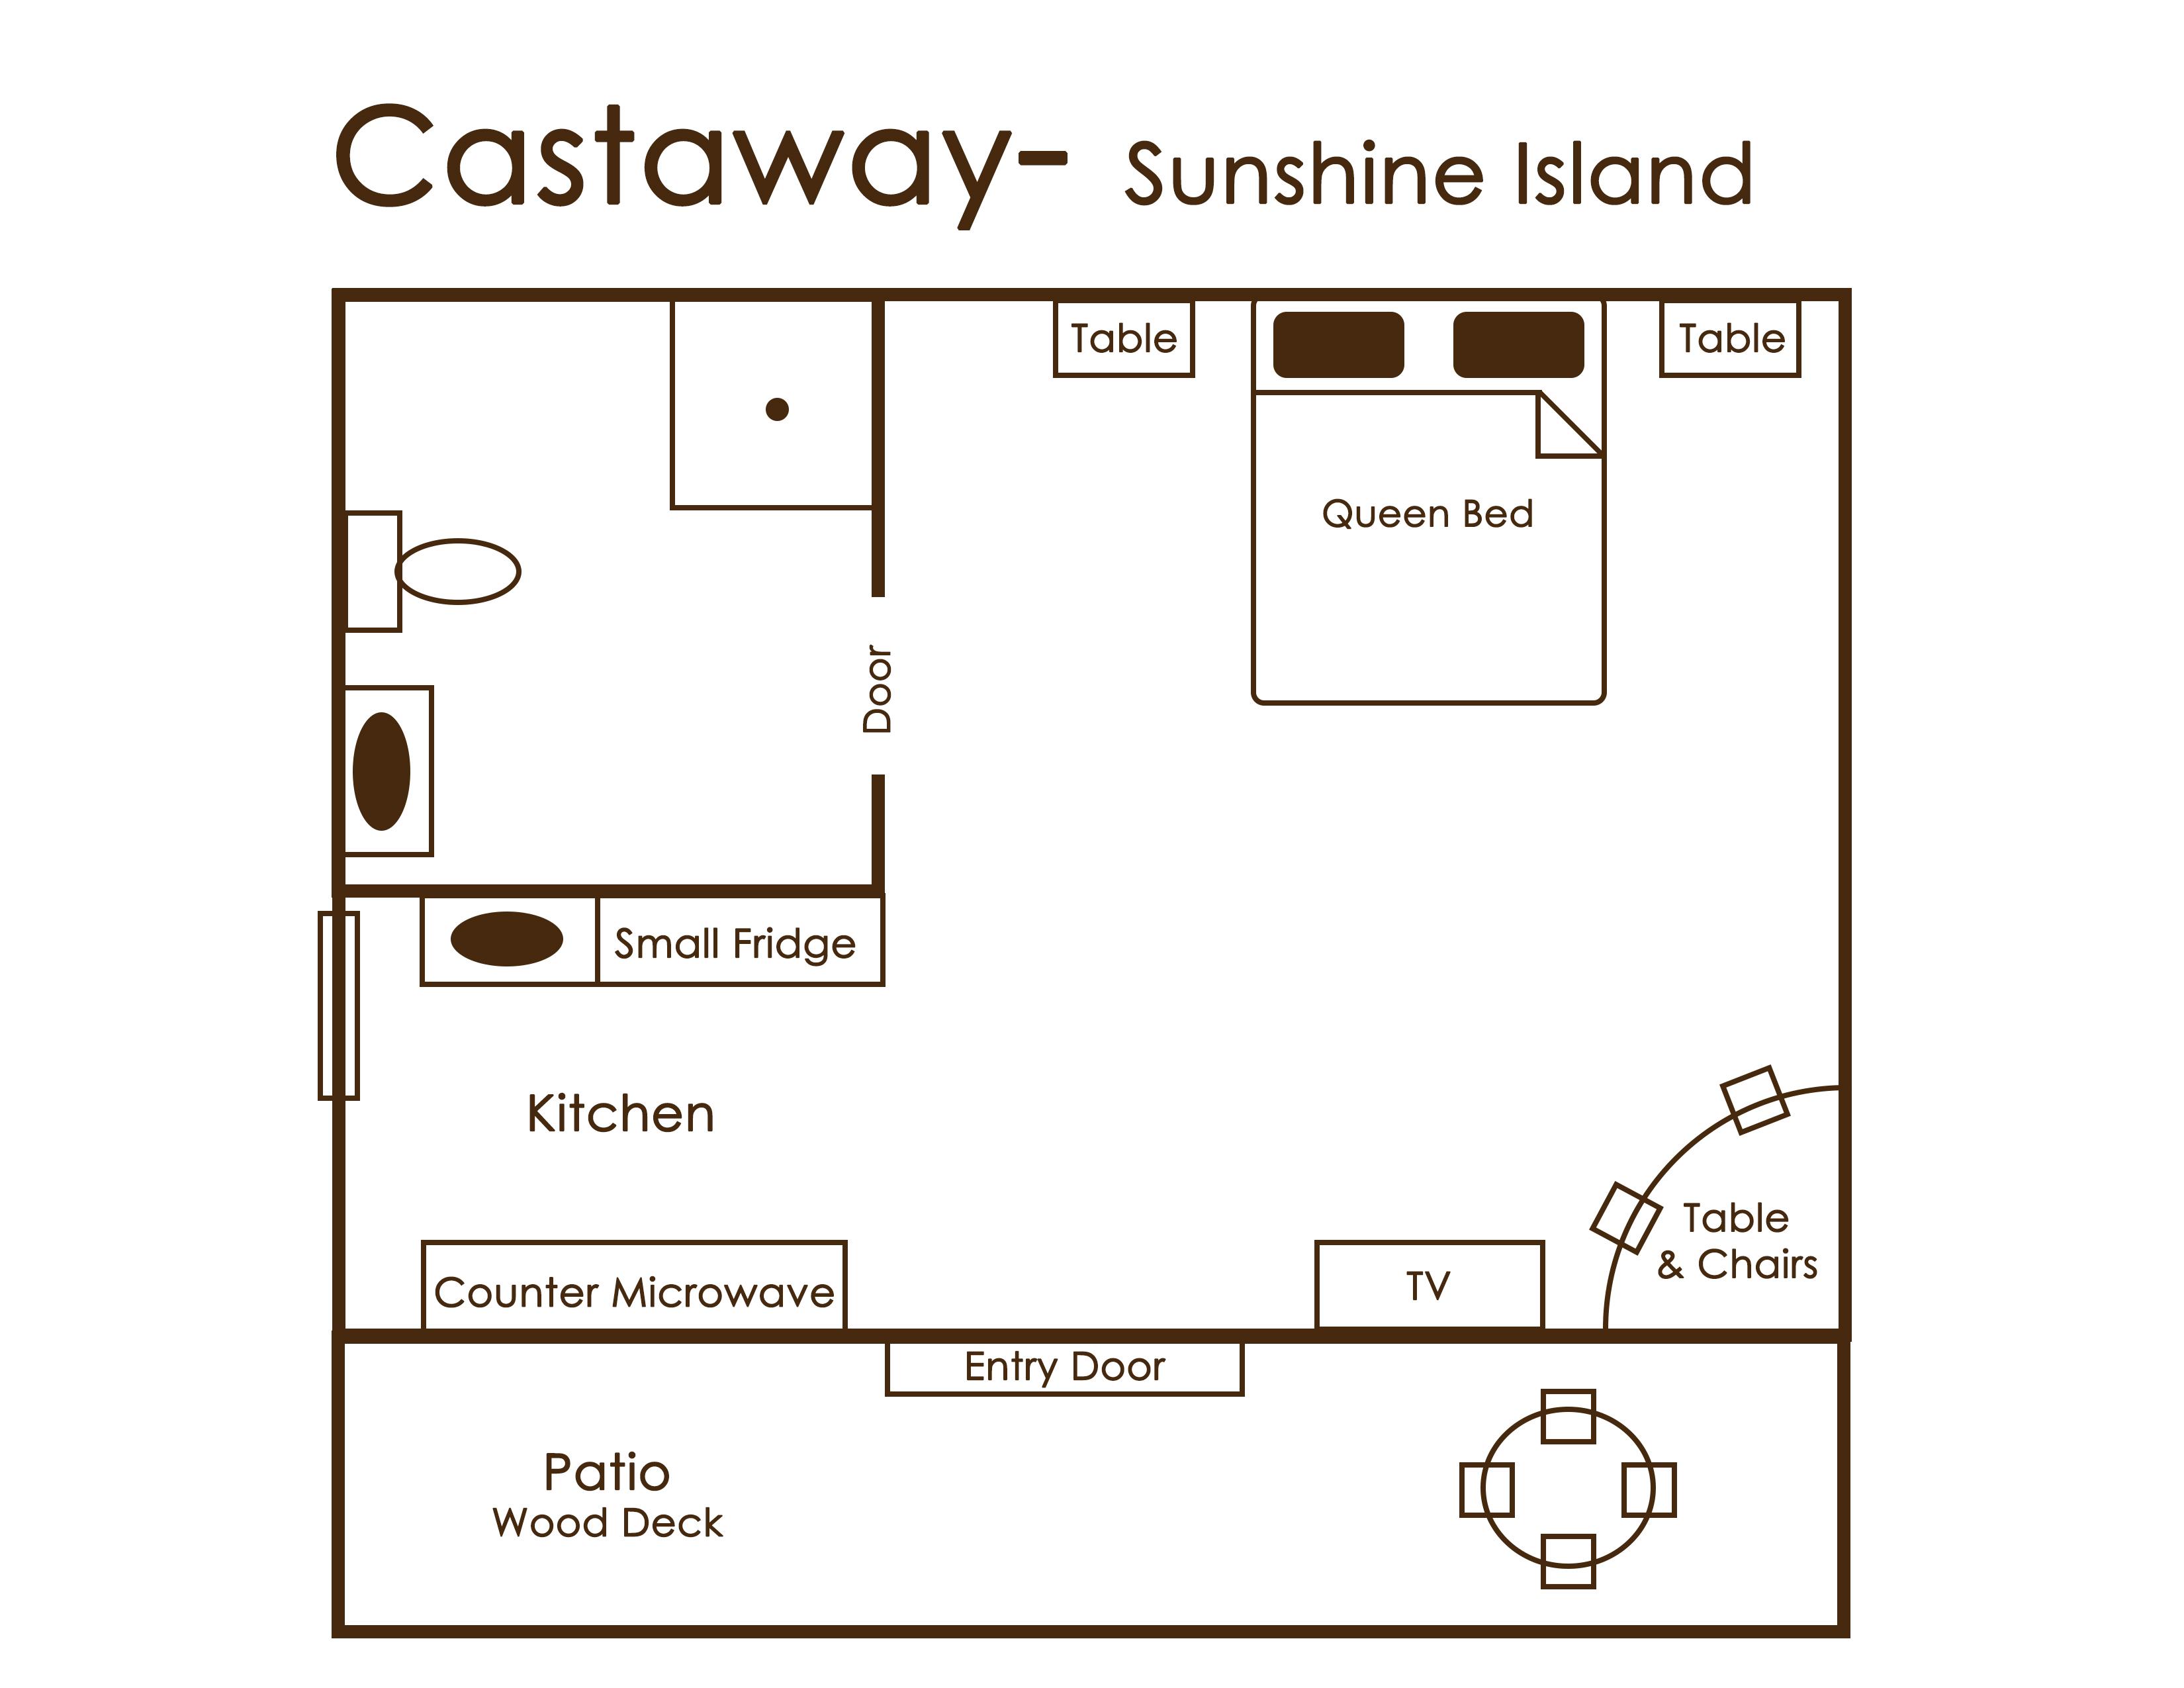 Castaway sunshine island